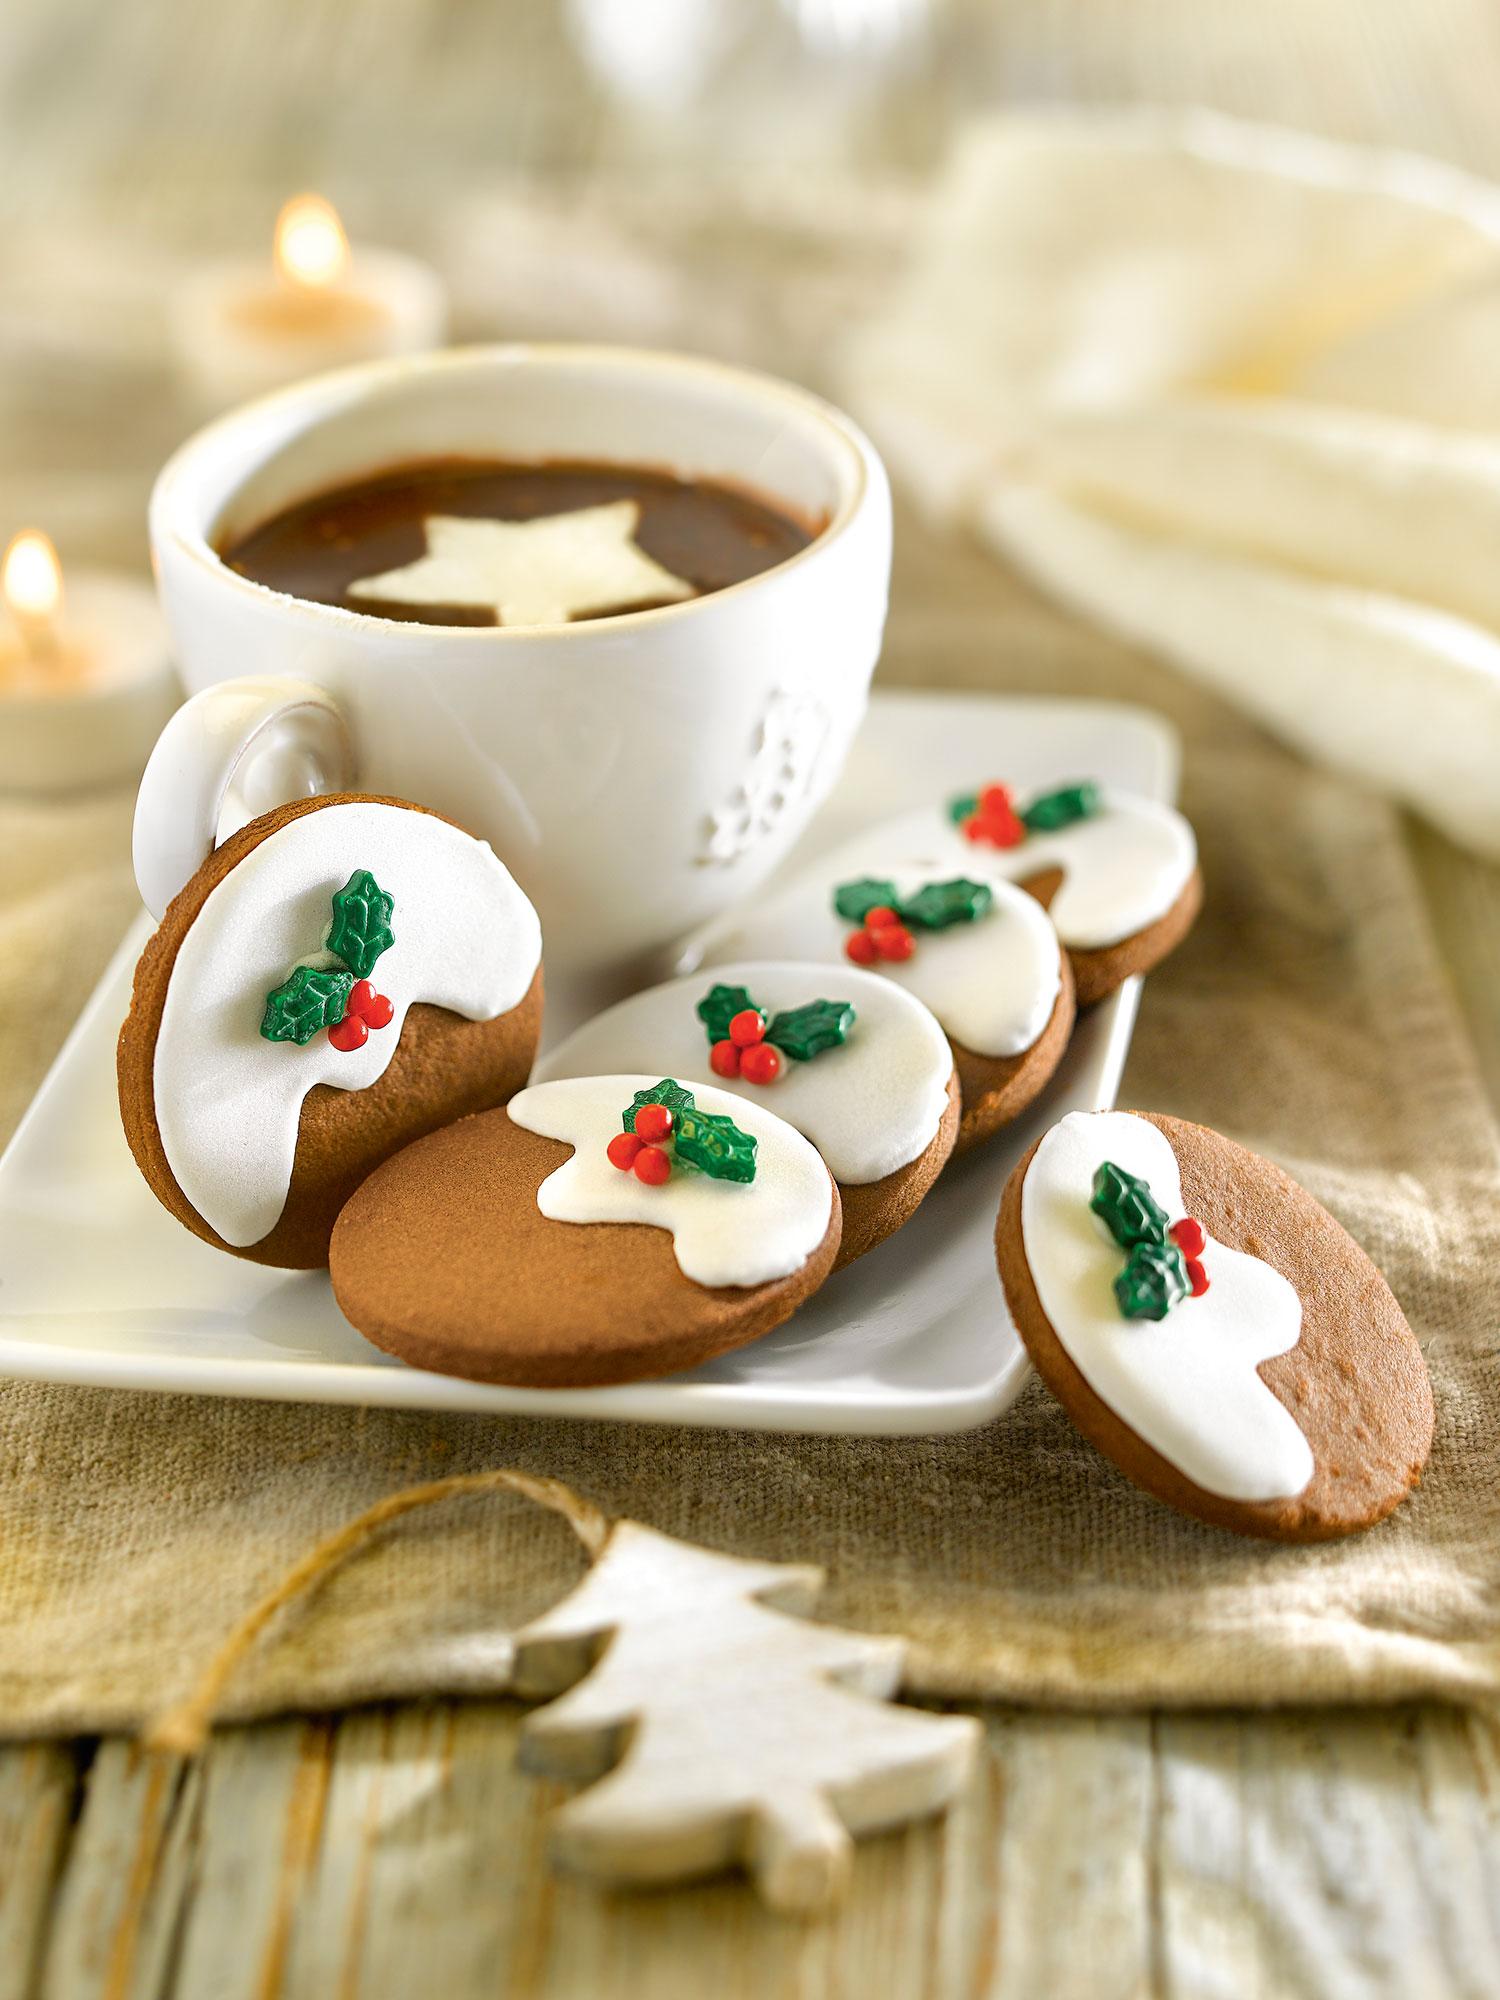 Recetas De Cocina Navideñas Faciles | Galletas De Navidad 9 Recetas Faciles Y Muy Originales